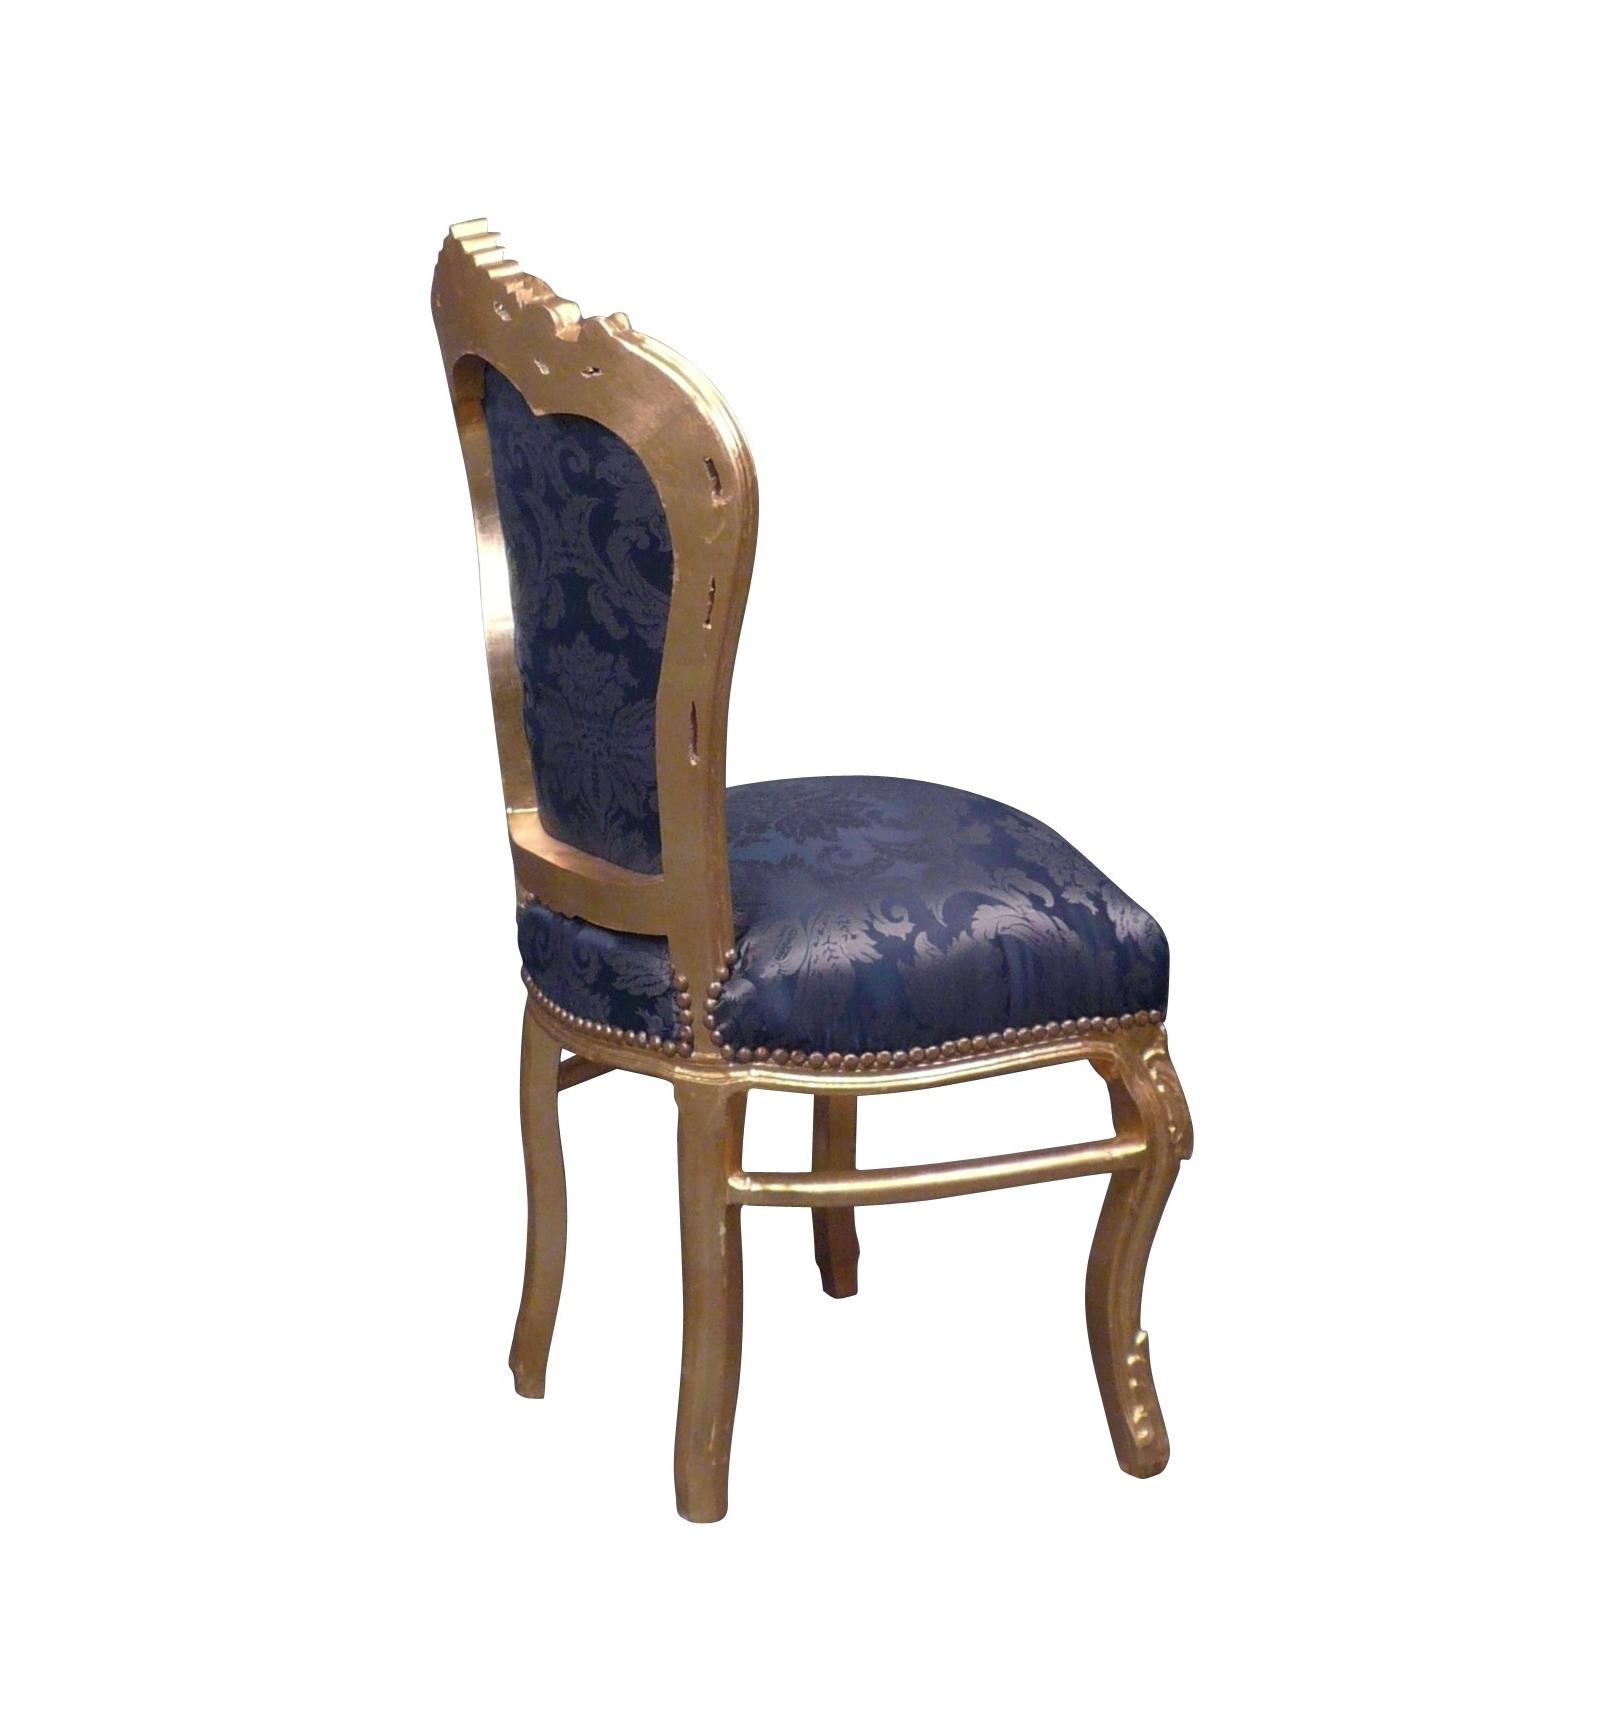 Barock Stuhl In Schwarzem Samt Und Silber Holz Barocke